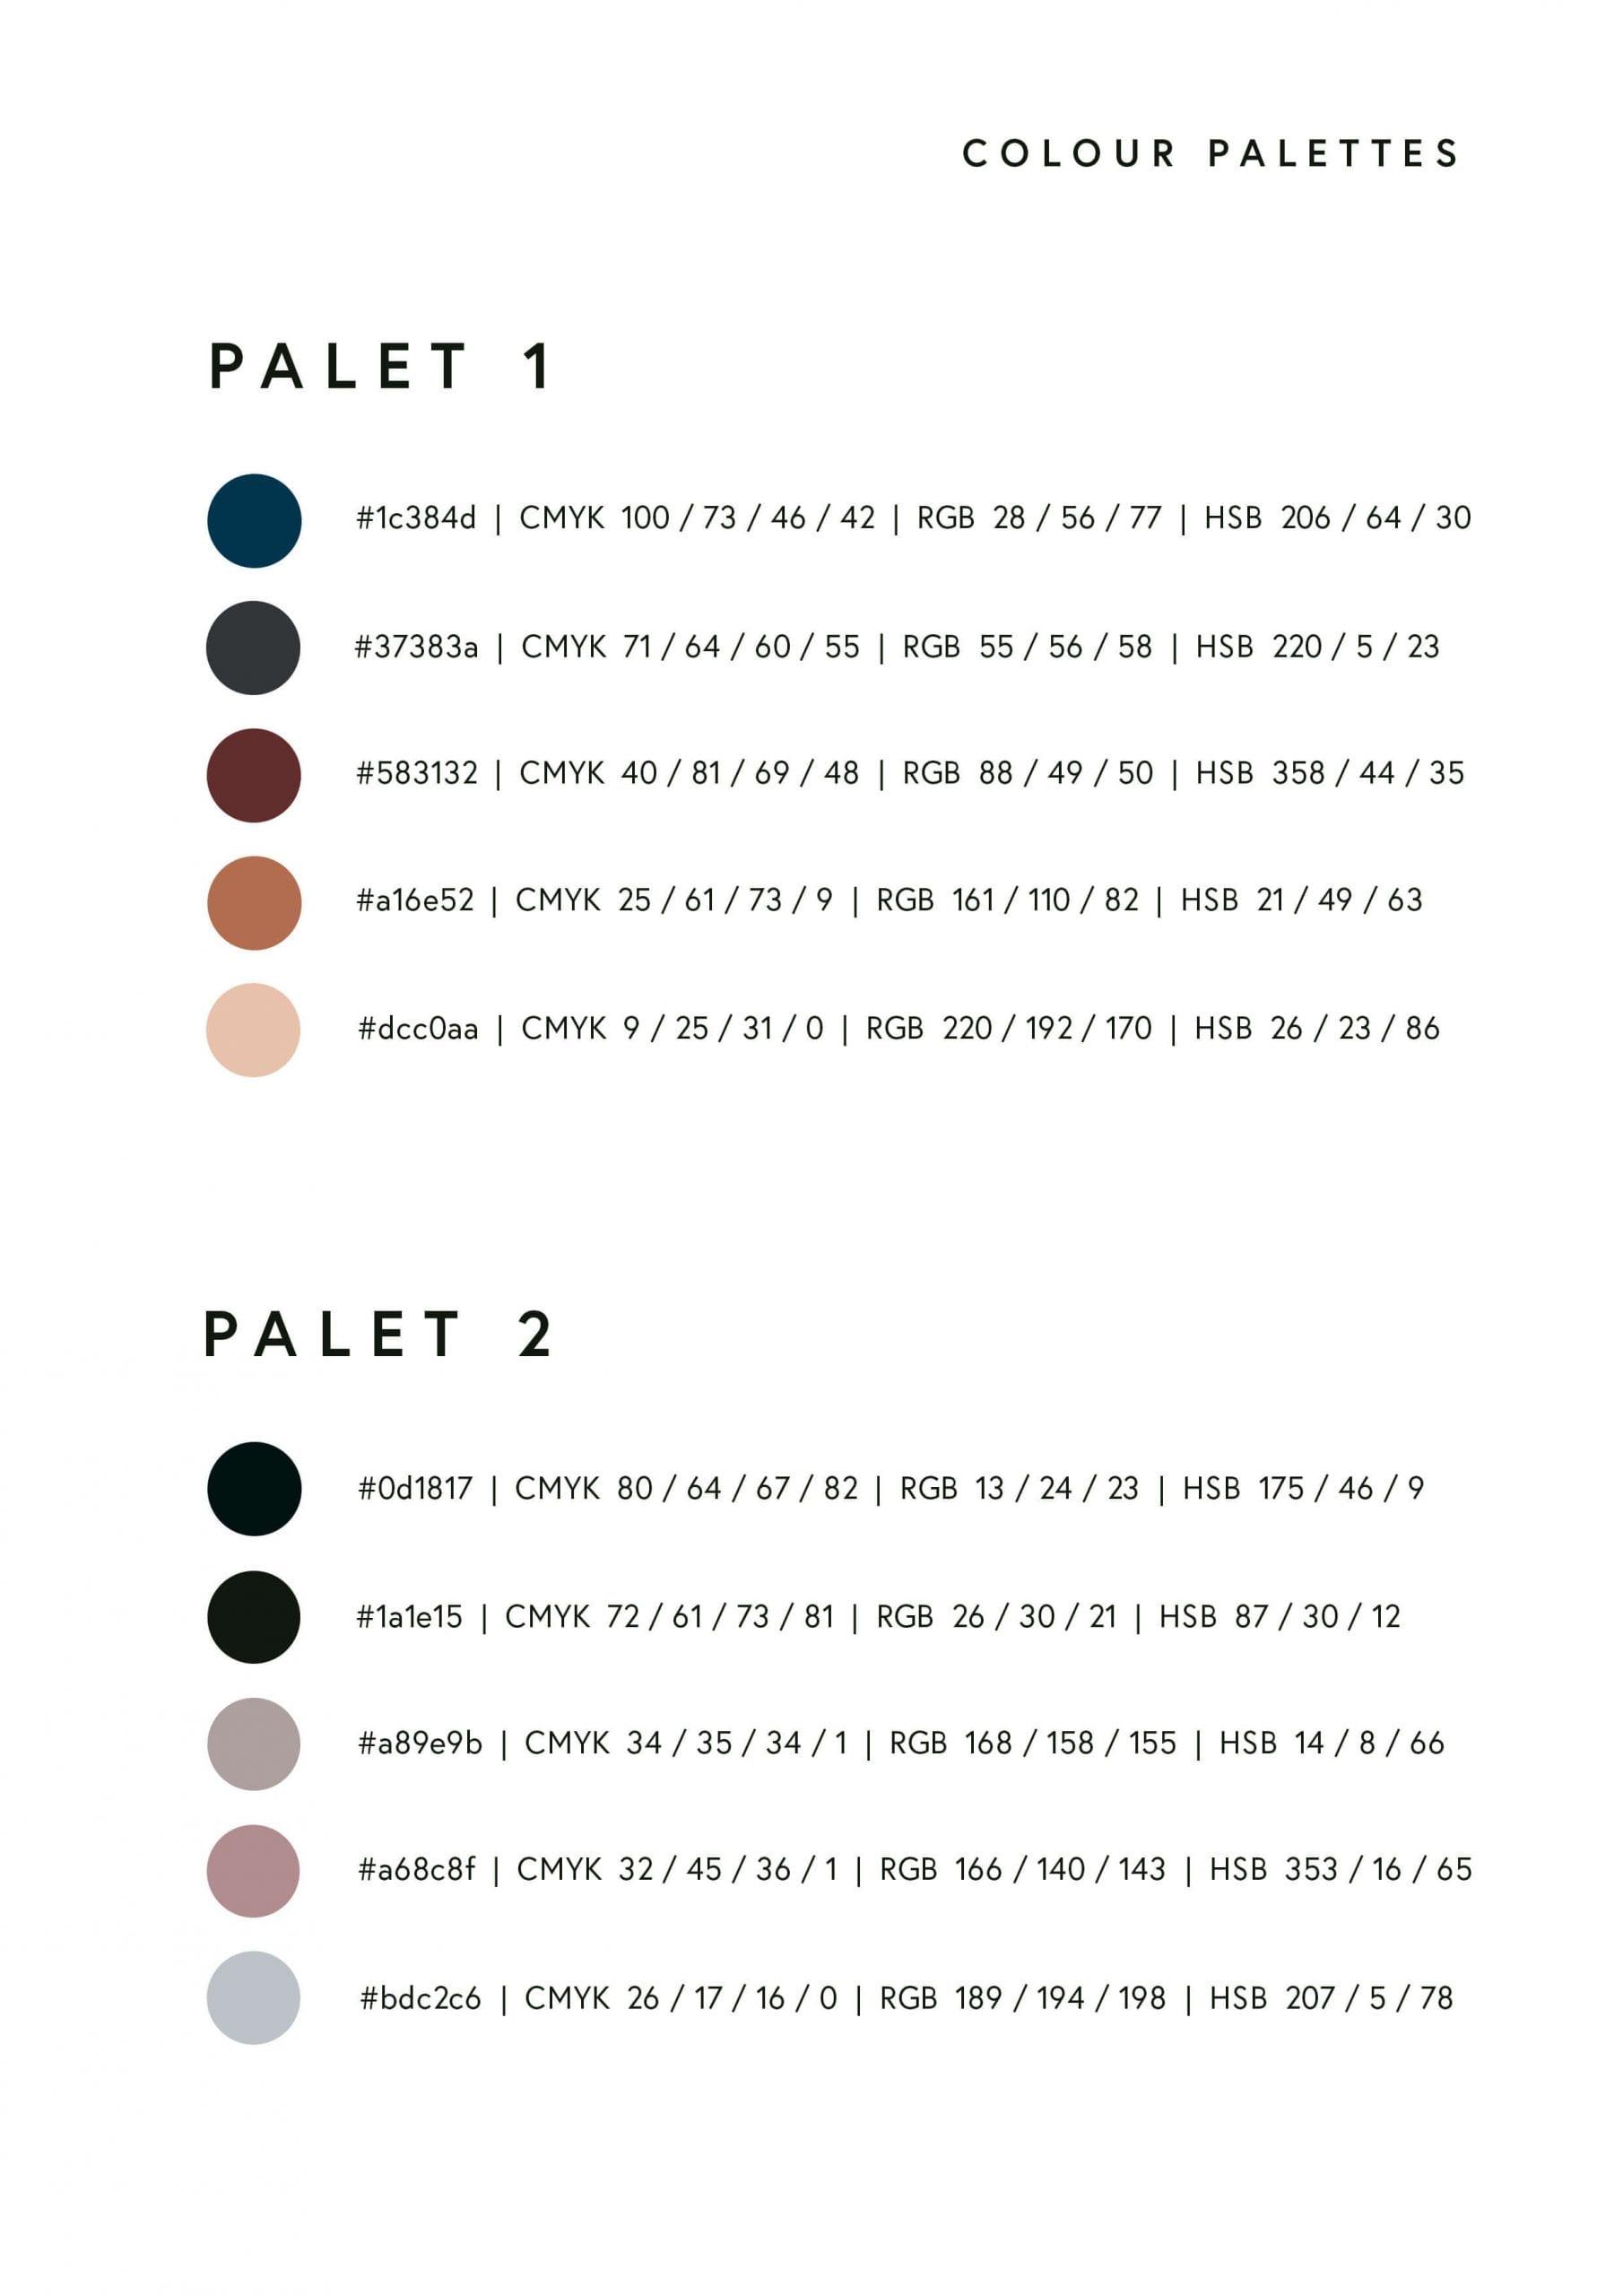 ann-rod-interior-styling-advice-colour-palettes